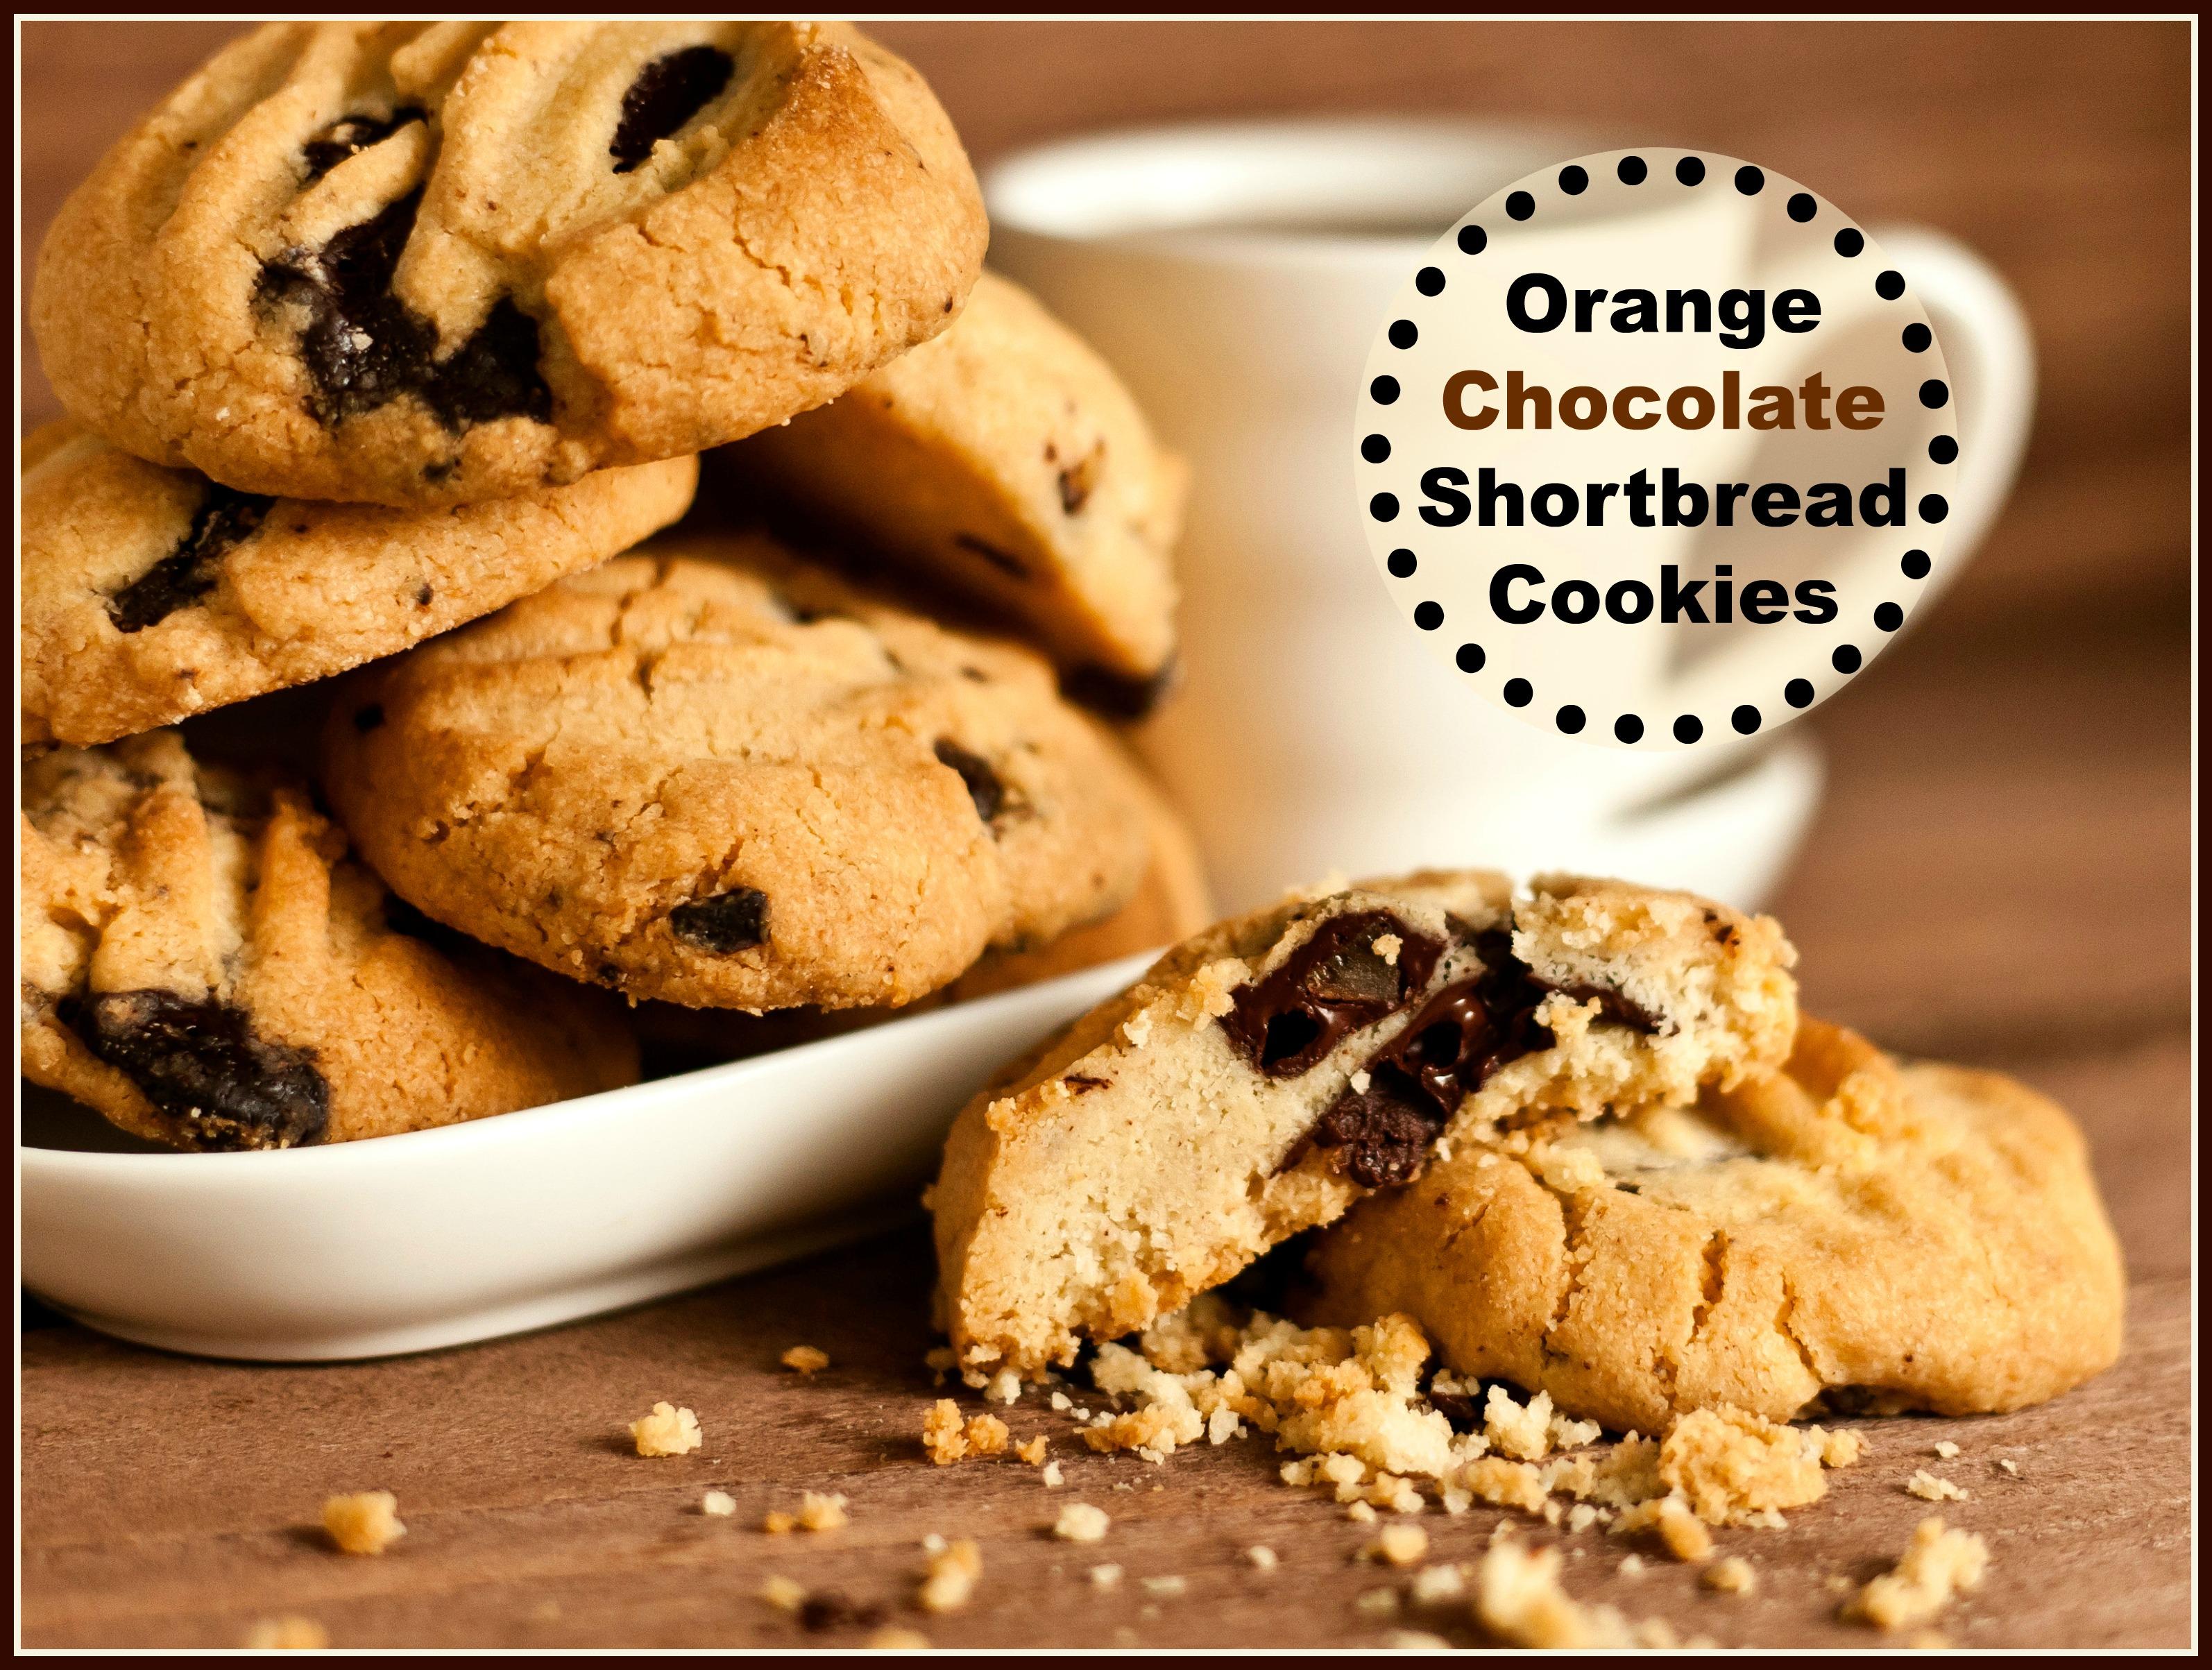 Orange Chocolate Shortbread Cookies